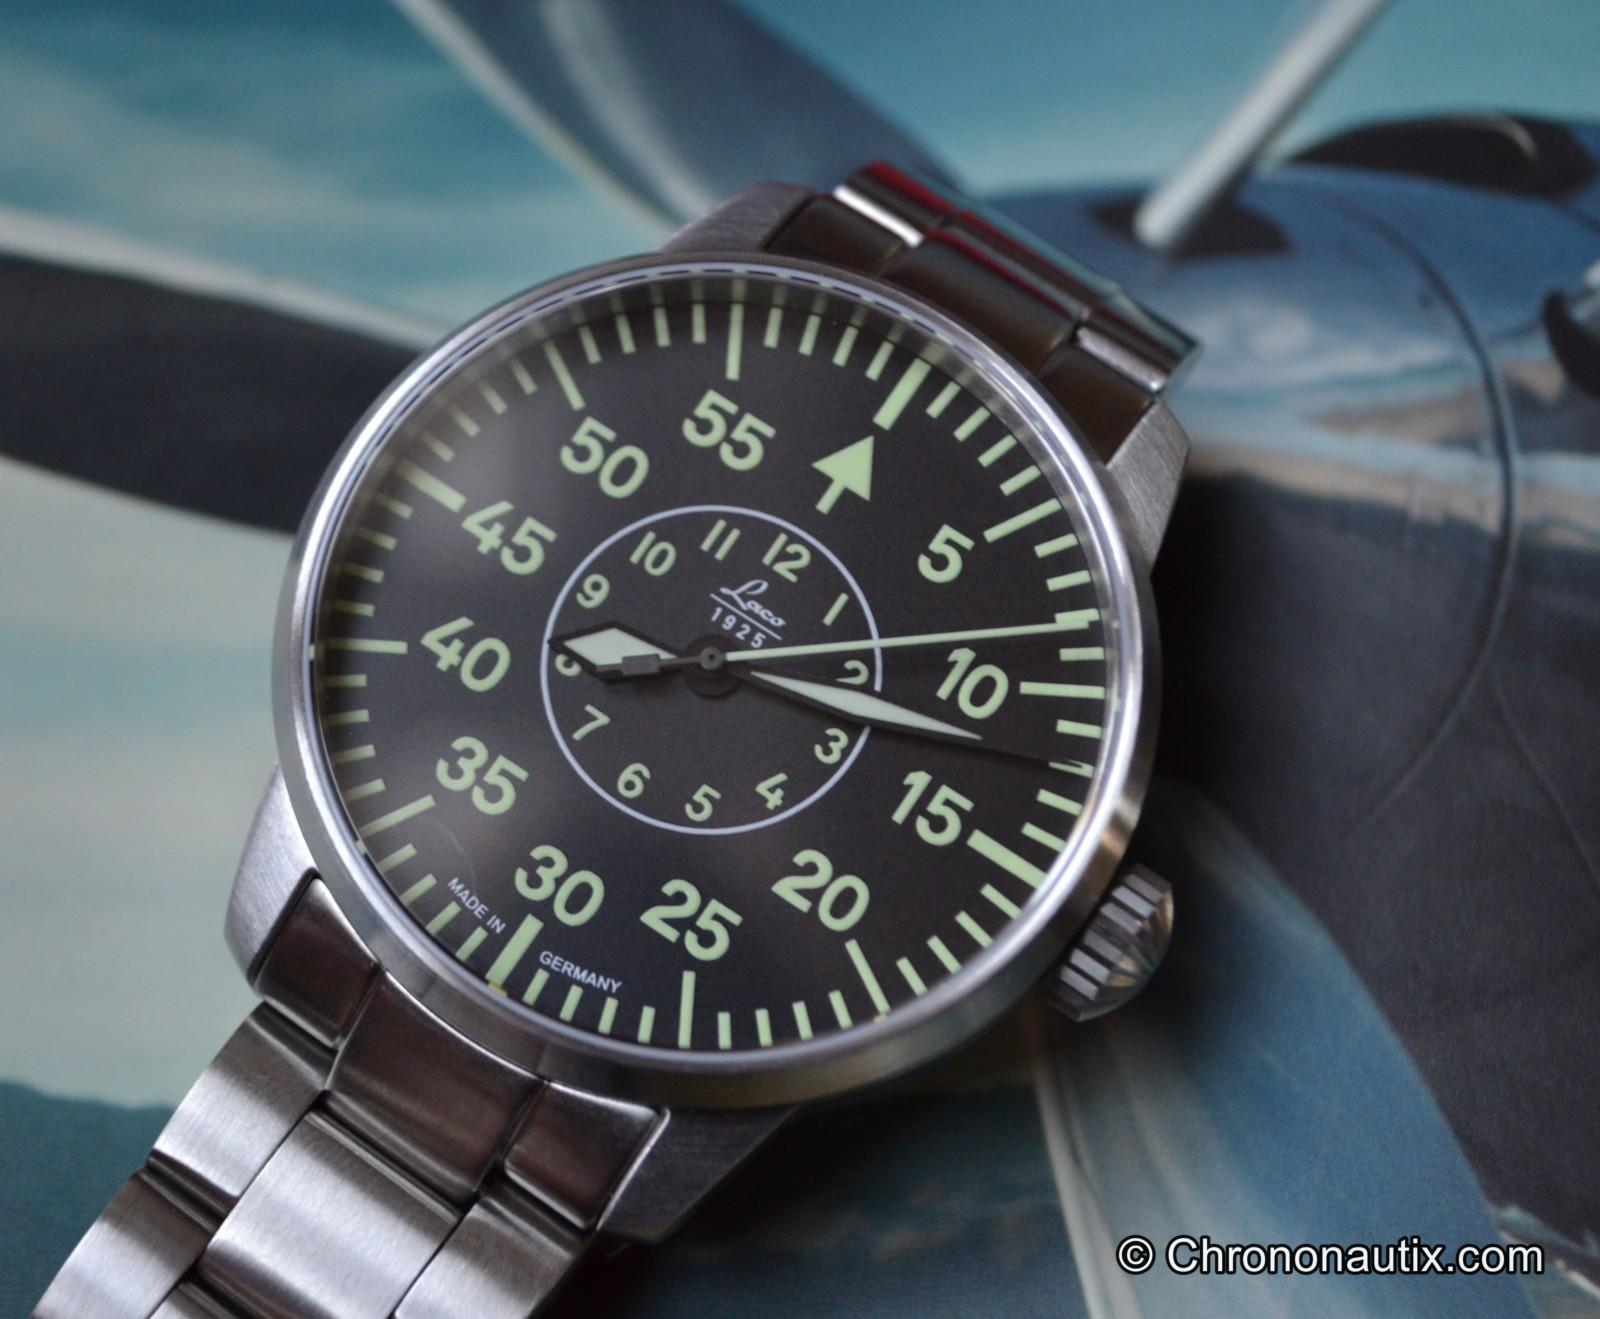 Laco Faro B-Muster Beobachtungsuhr Fliegeruhr Pilotenuhr 2. WK